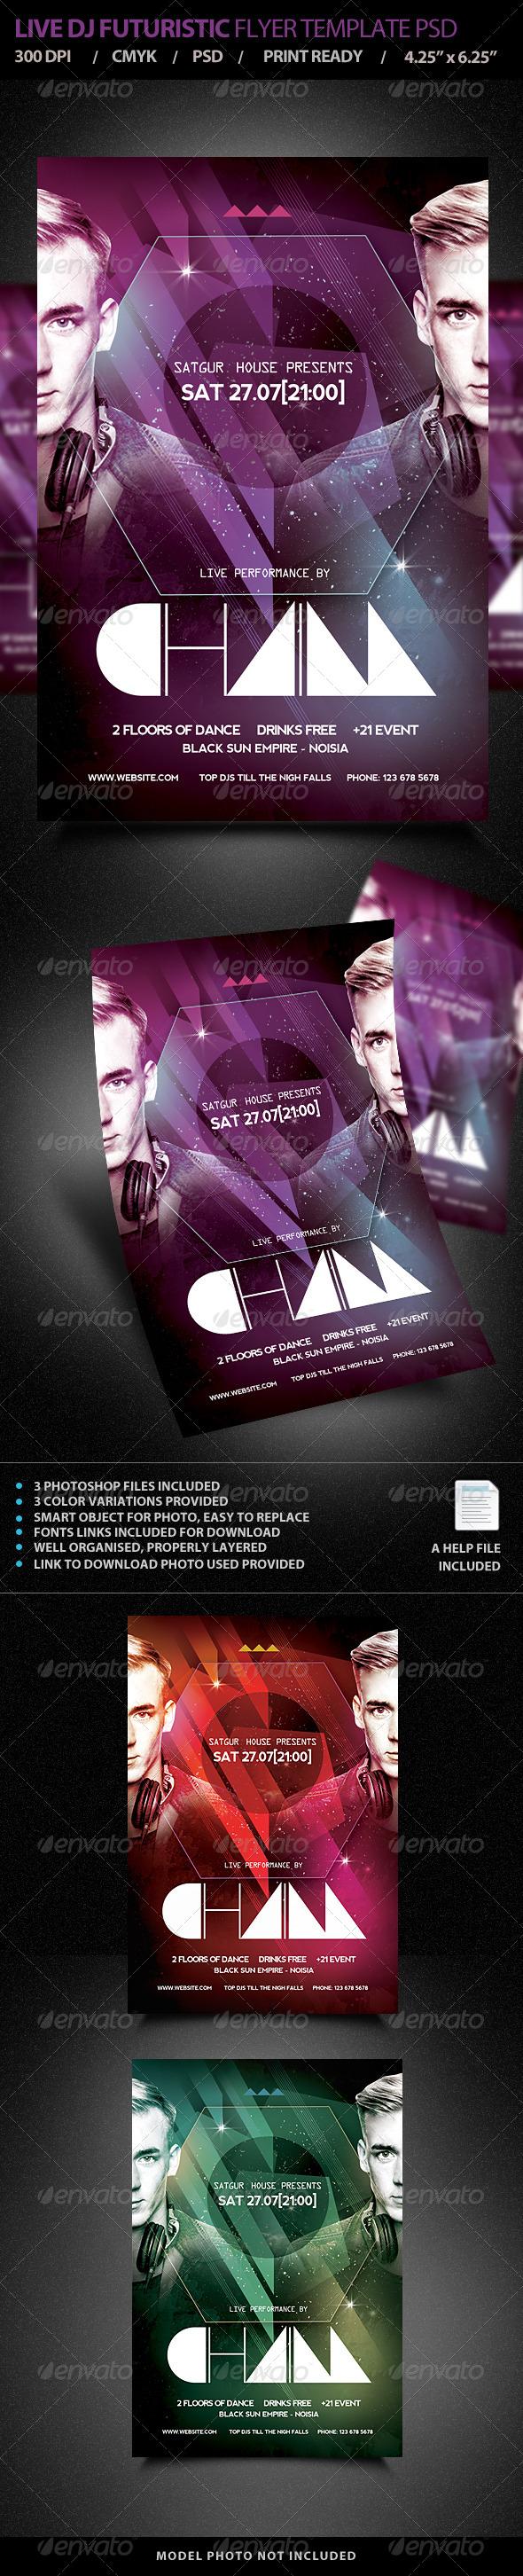 GraphicRiver Live DJ Futuristic Flyer Template PSD 7412609